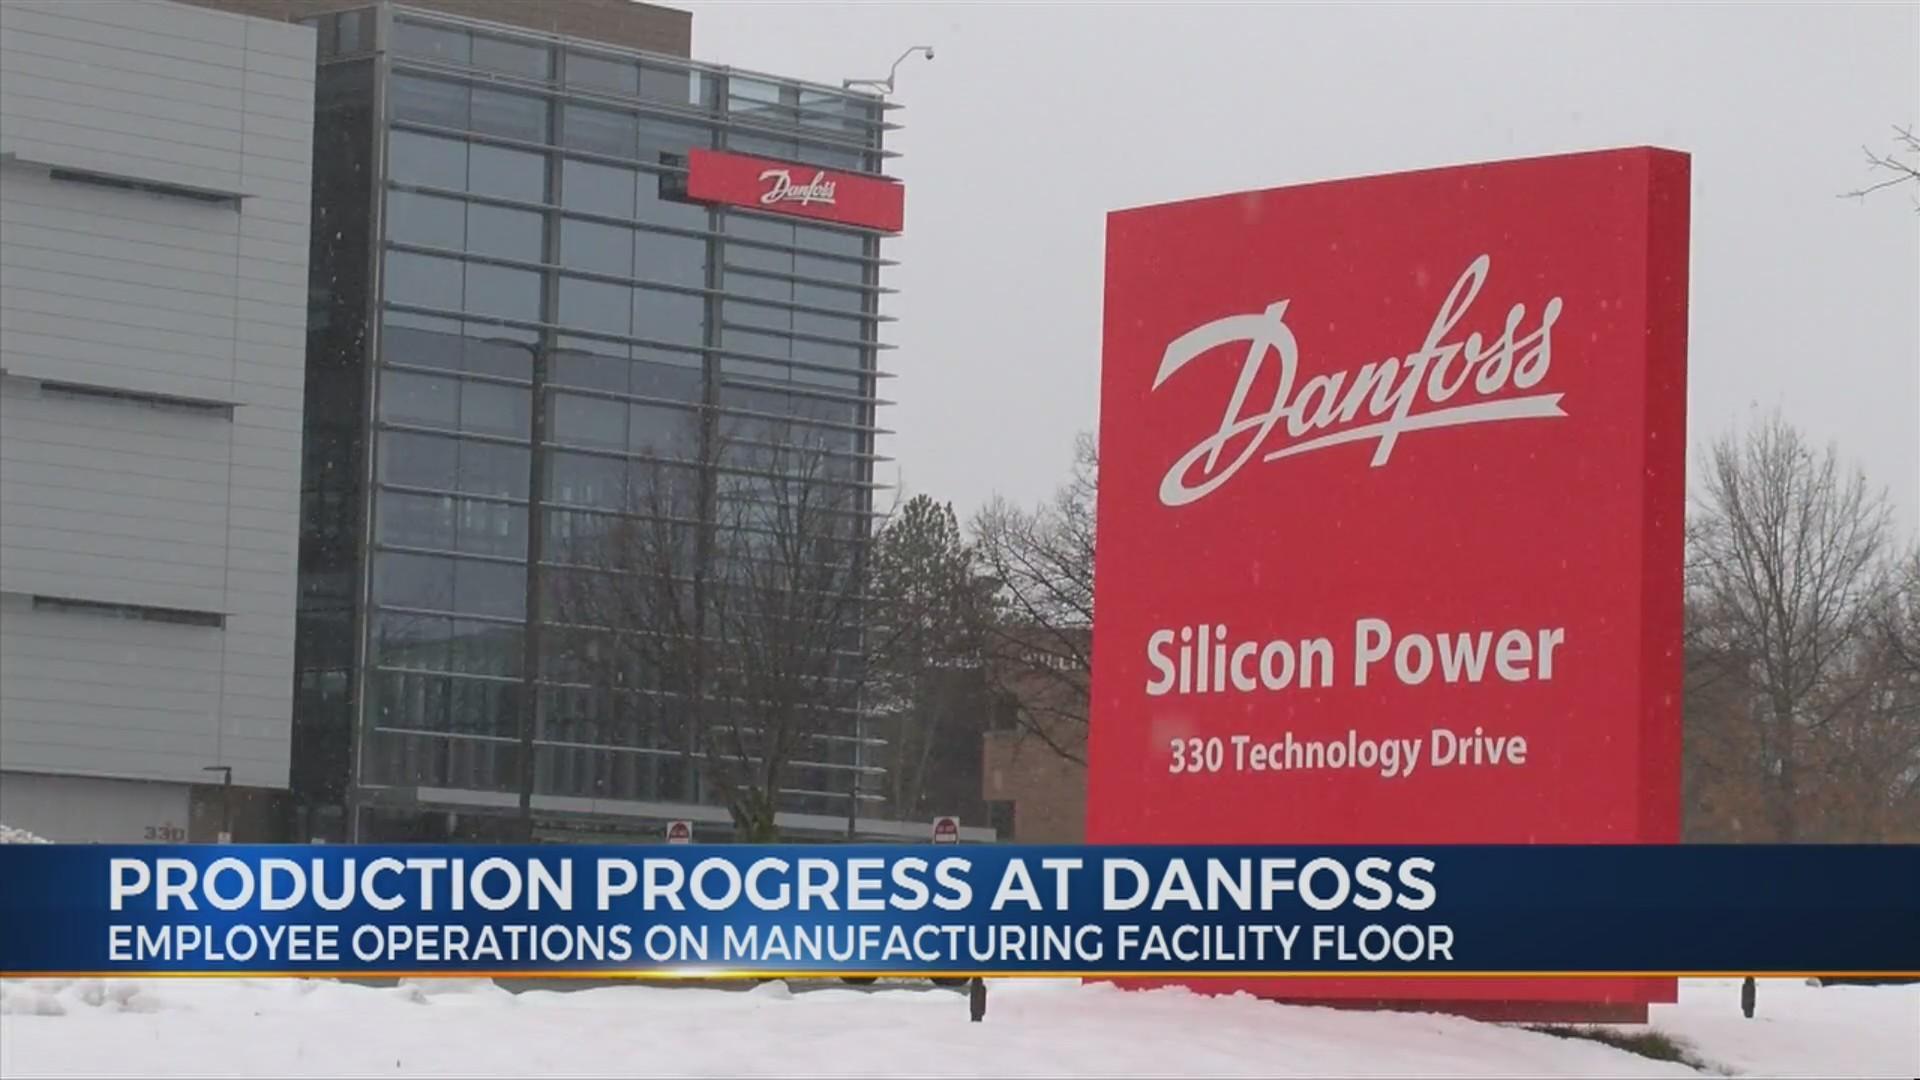 Production_Progress_at_Danfoss_0_20181130231657